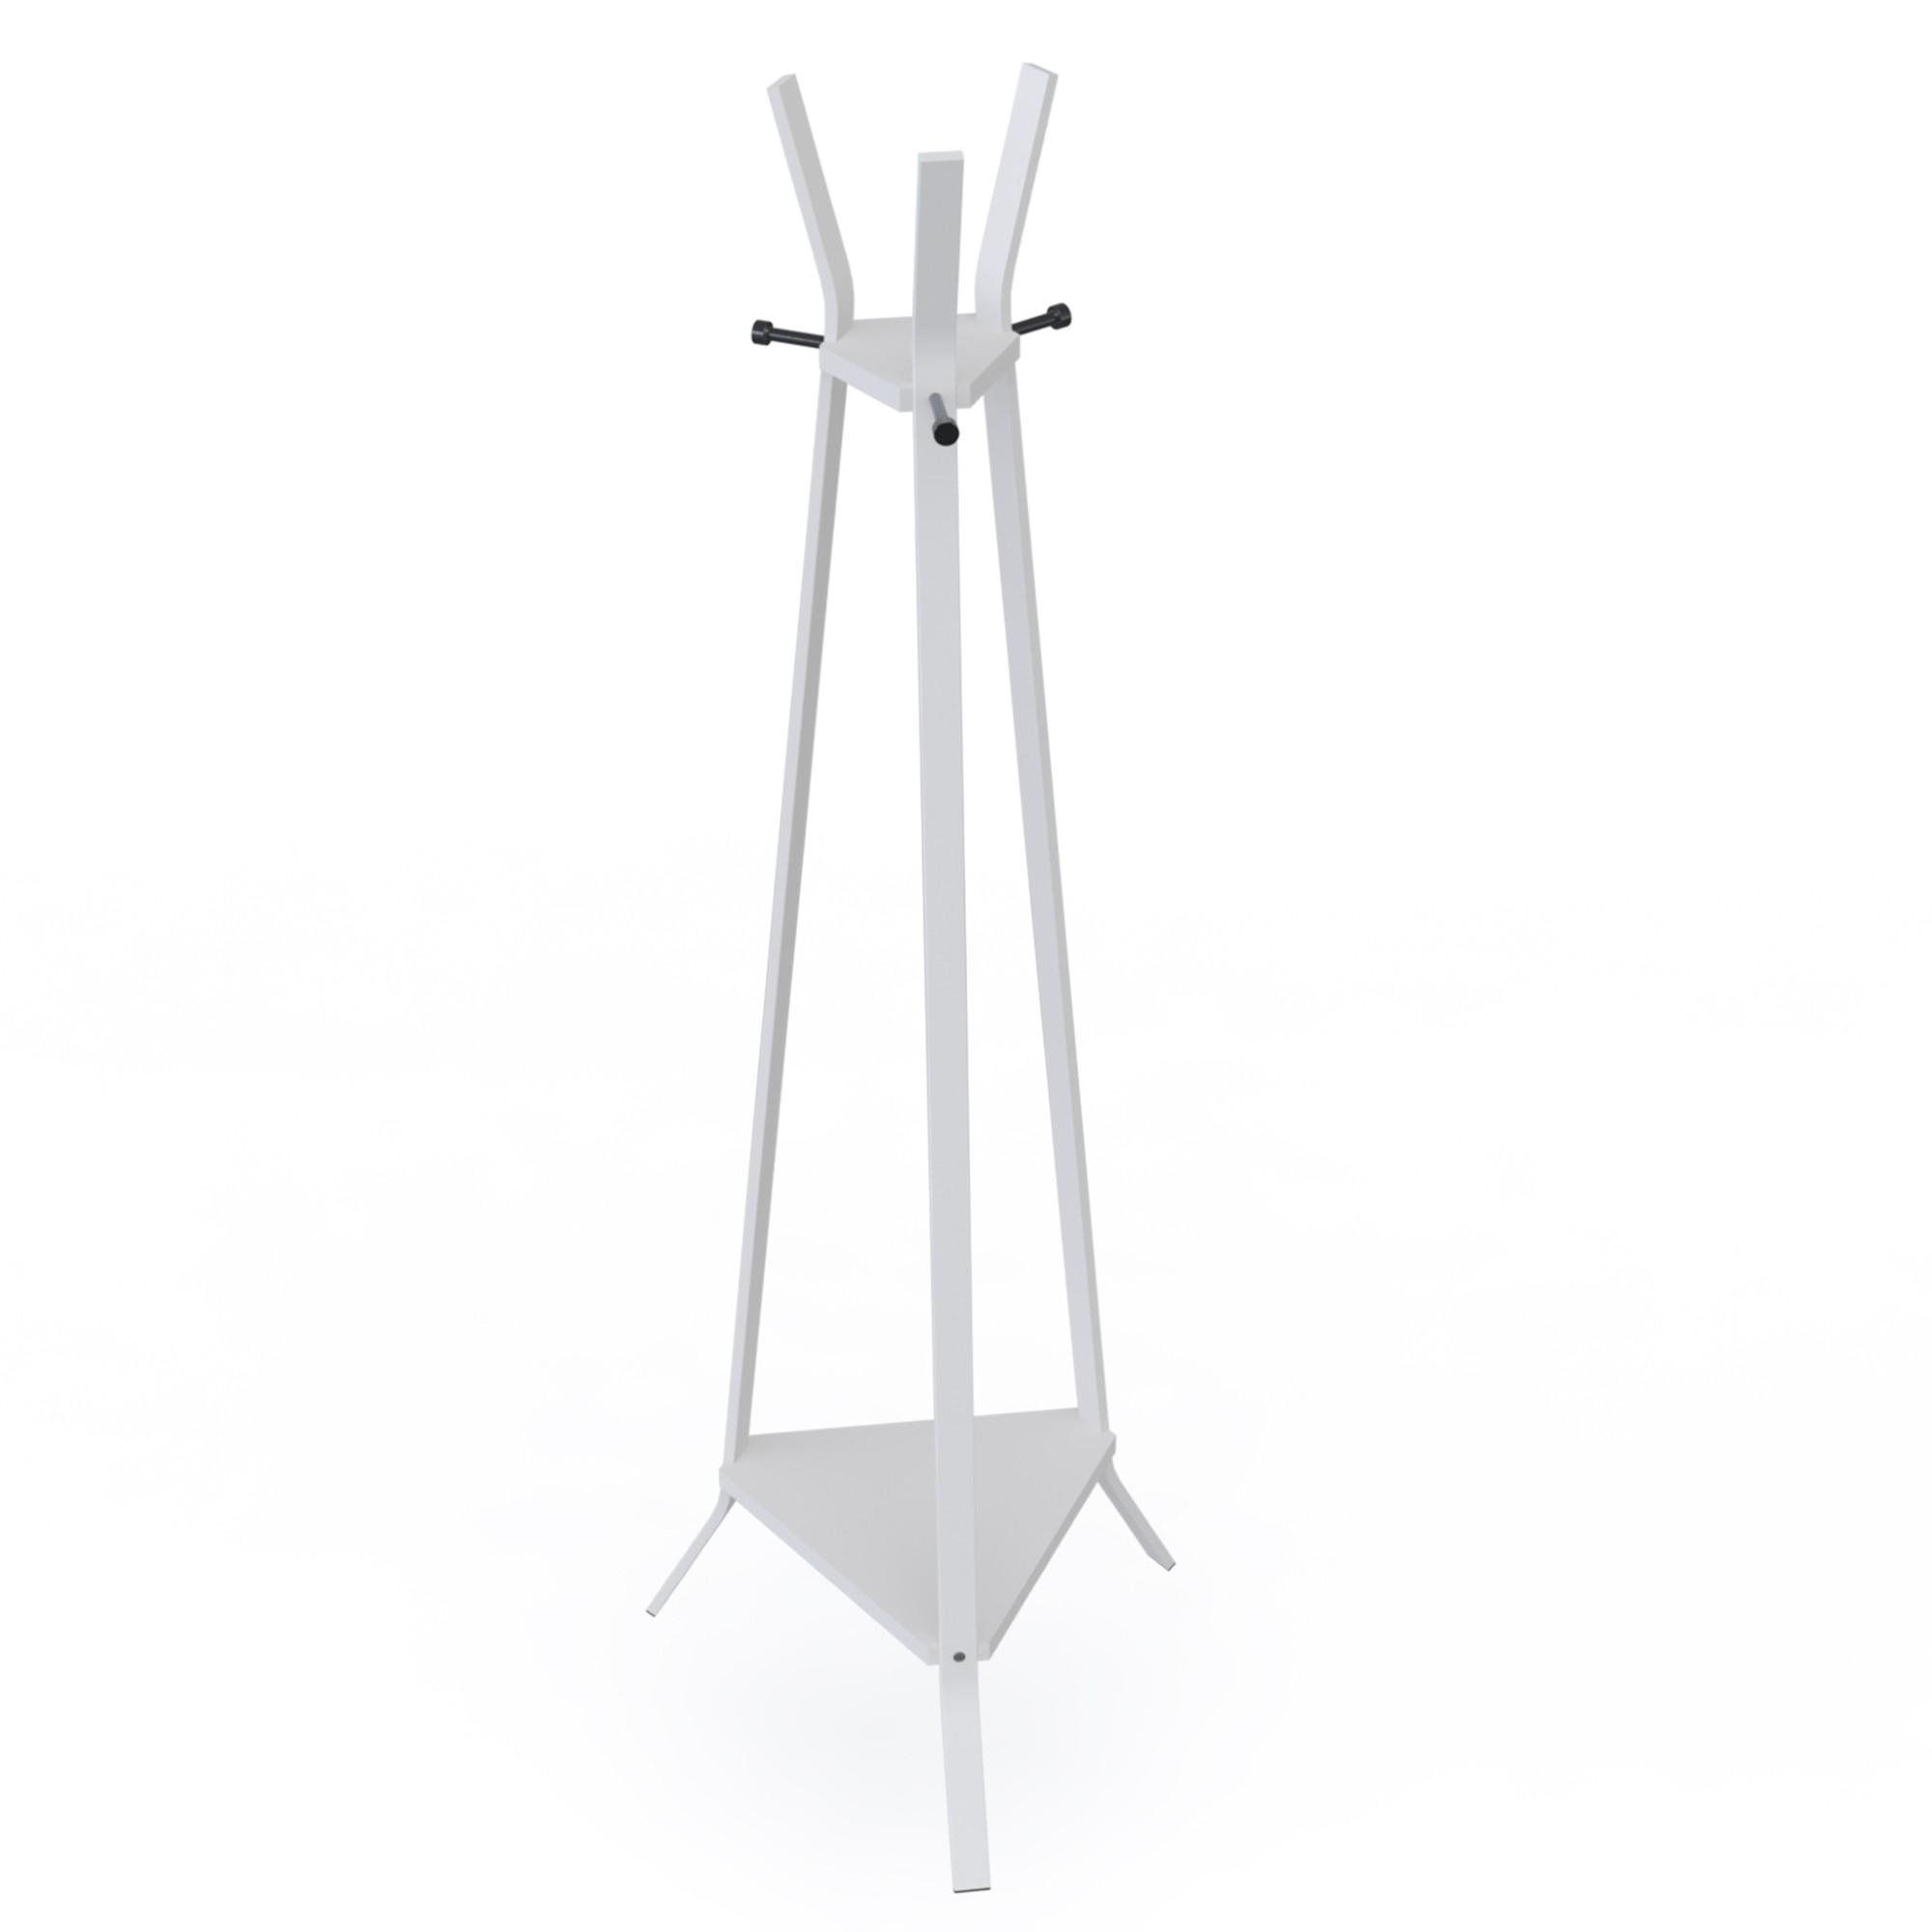 Cabideiro Triangular Aco 143cm Branco - DiCarlo